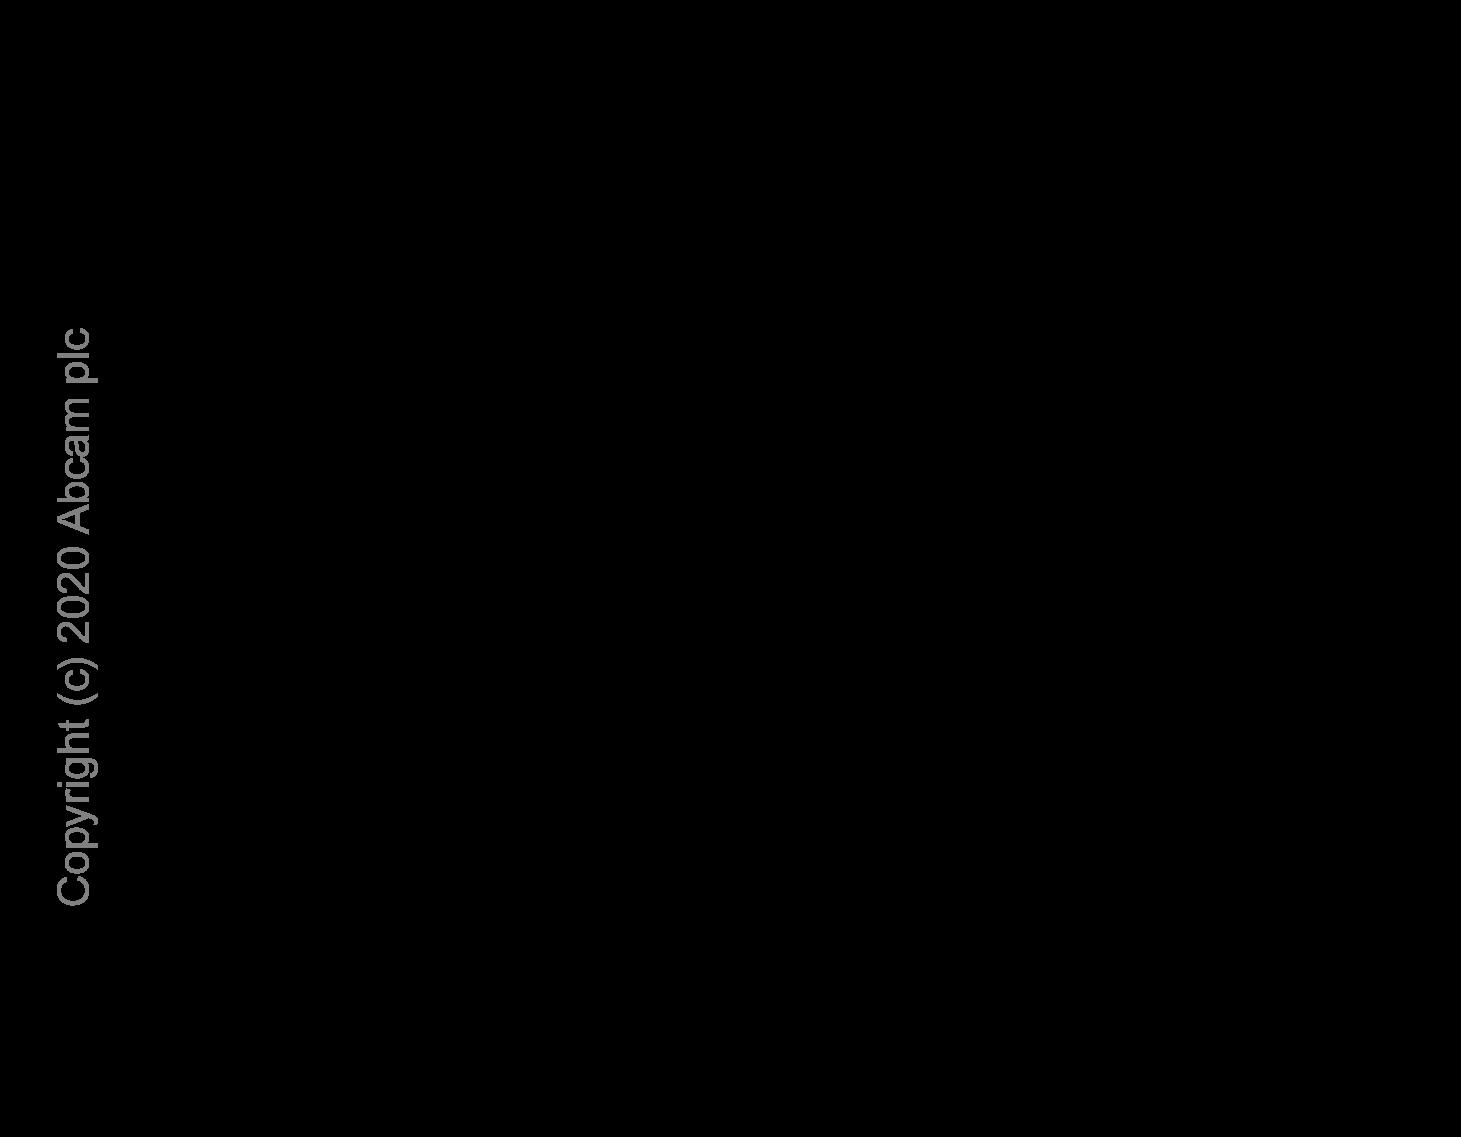 ELISA - Anti-FGFR2 antibody [SP273] - BSA and Azide free (ab272012)